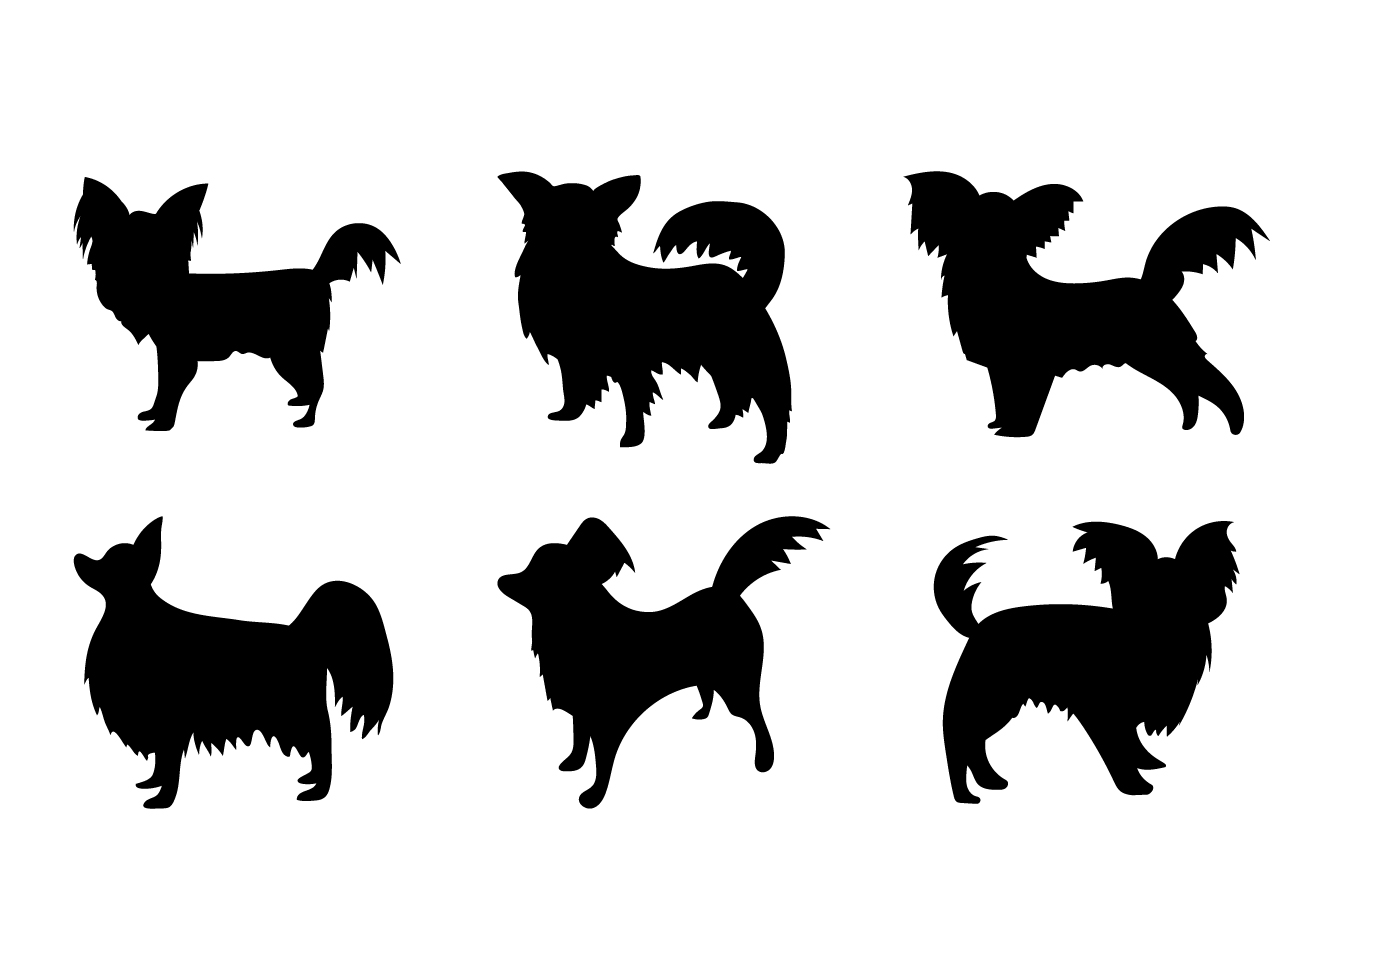 Black dog trading system download free